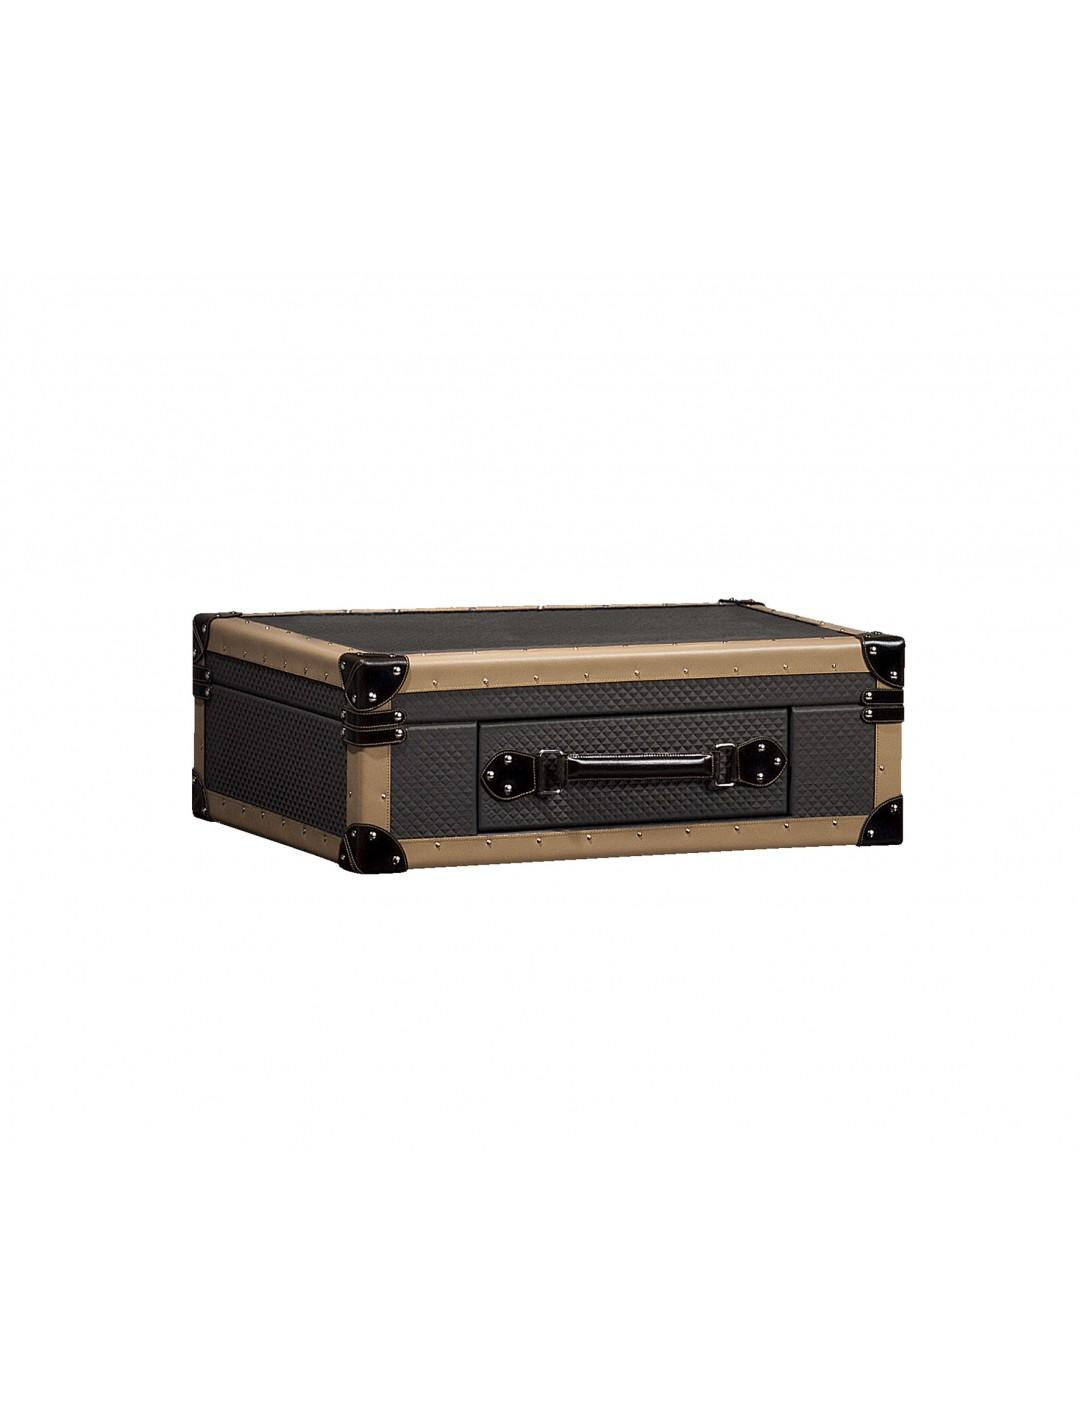 TRAVELER SUITCASE BOX, FINISH: LEATHER, SMALL SIZE, WITH ALEXANDRA KEYRING AND KEYS,